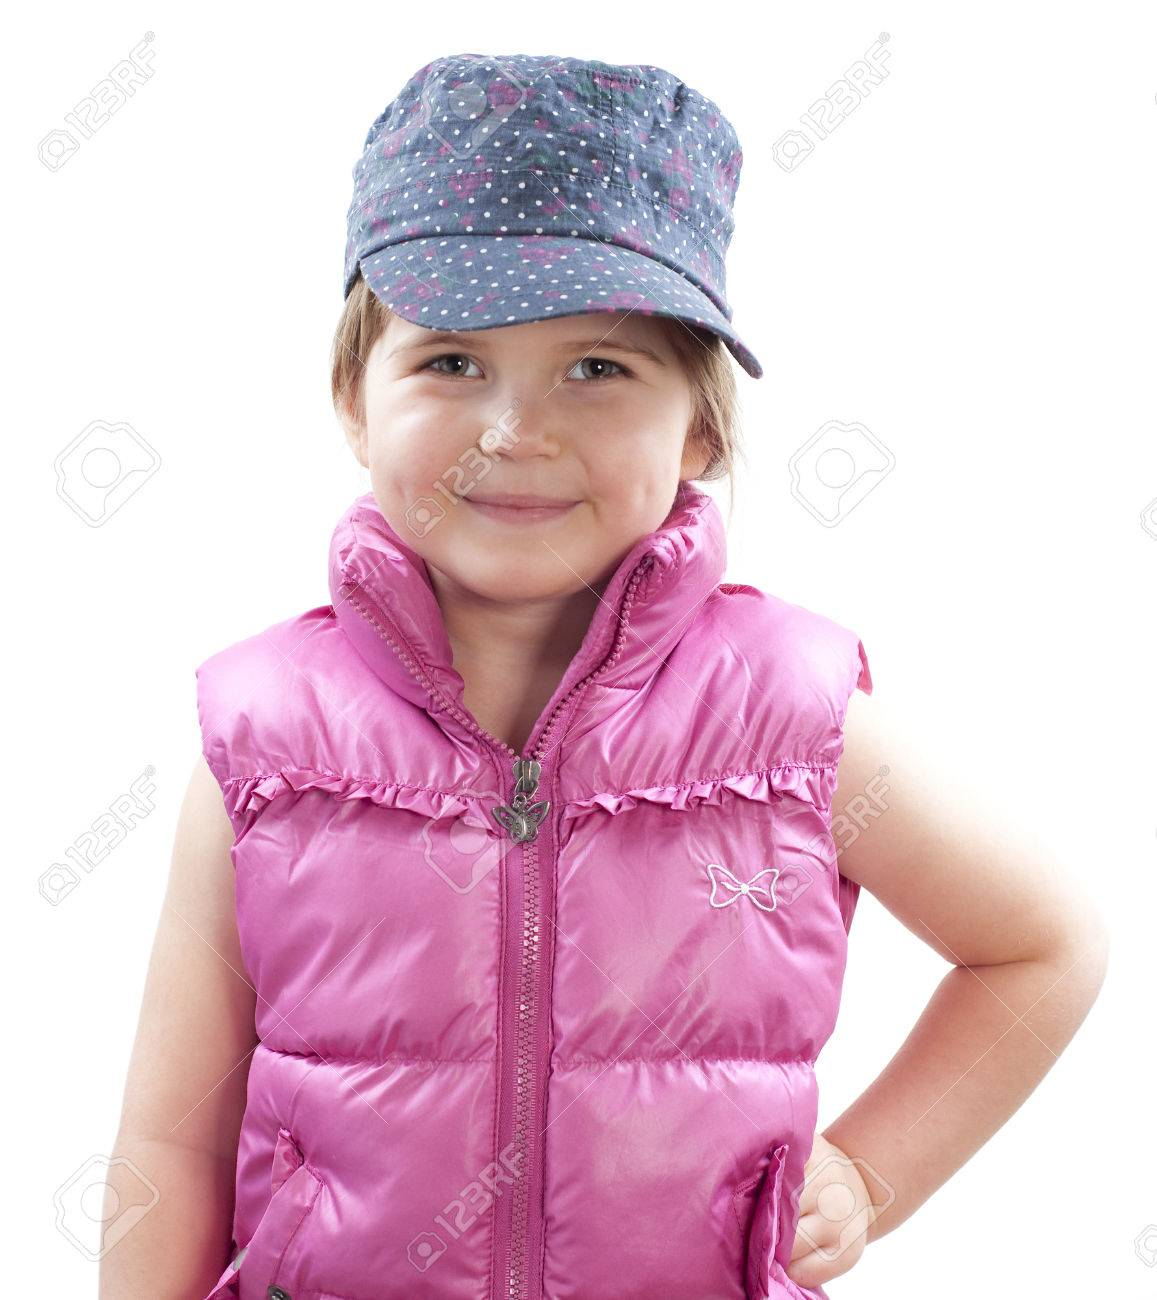 little girl wearing baseball cap and smiling on white Stock Photo - 29218251 8fbb6c1d762